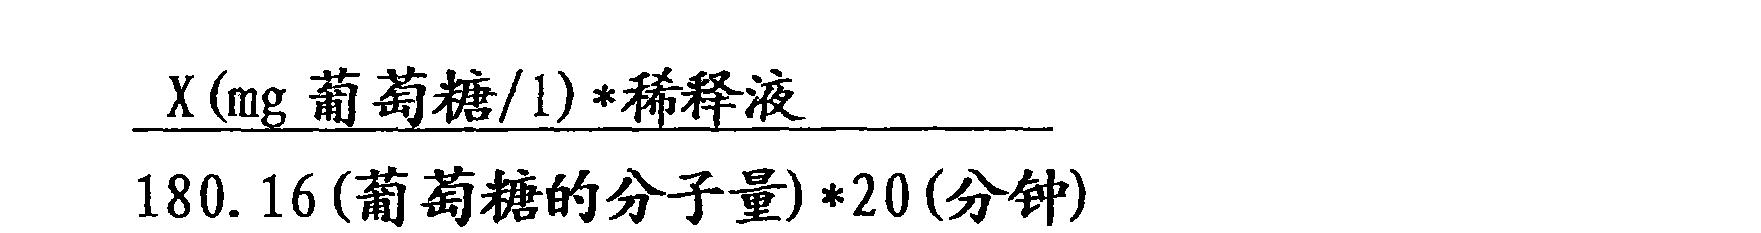 Figure CN102146362AD00481